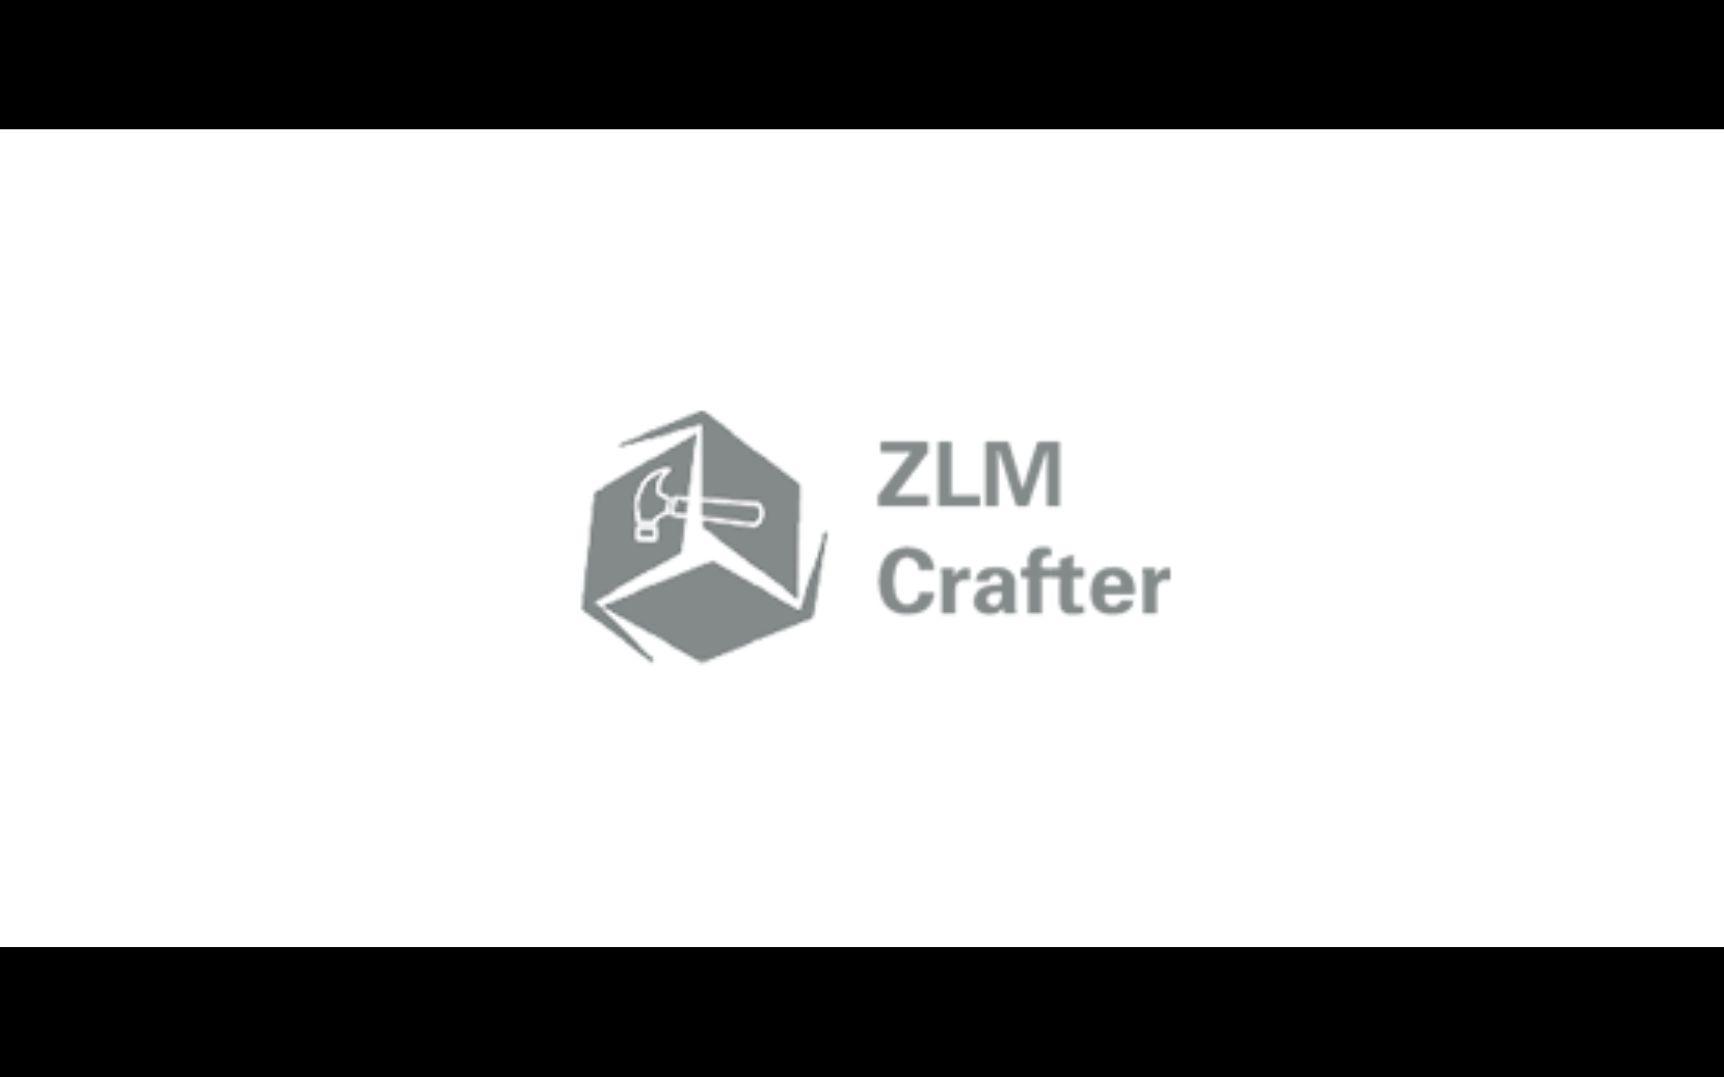 【STEAM单机游戏】ZLM工艺 -高画质建造模拟 - 宣传视频